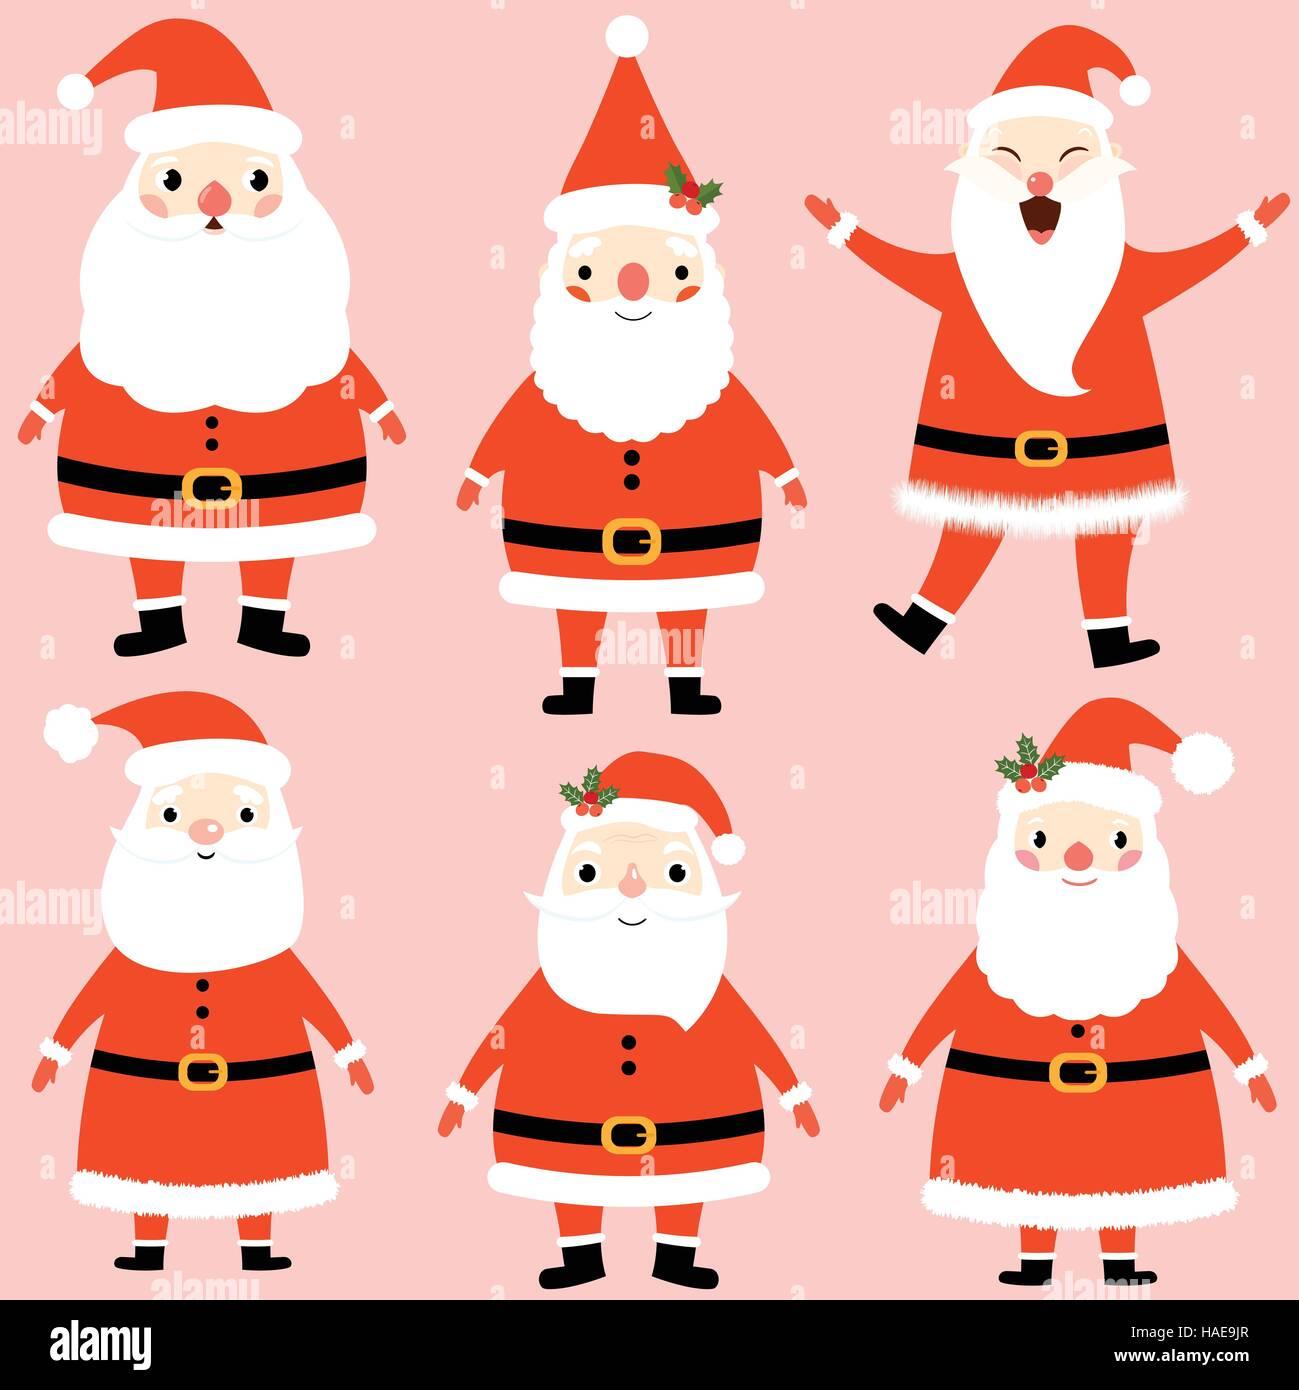 f33b33dc69e Cute Santa Claus characters set. Christmas holiday illustration ...